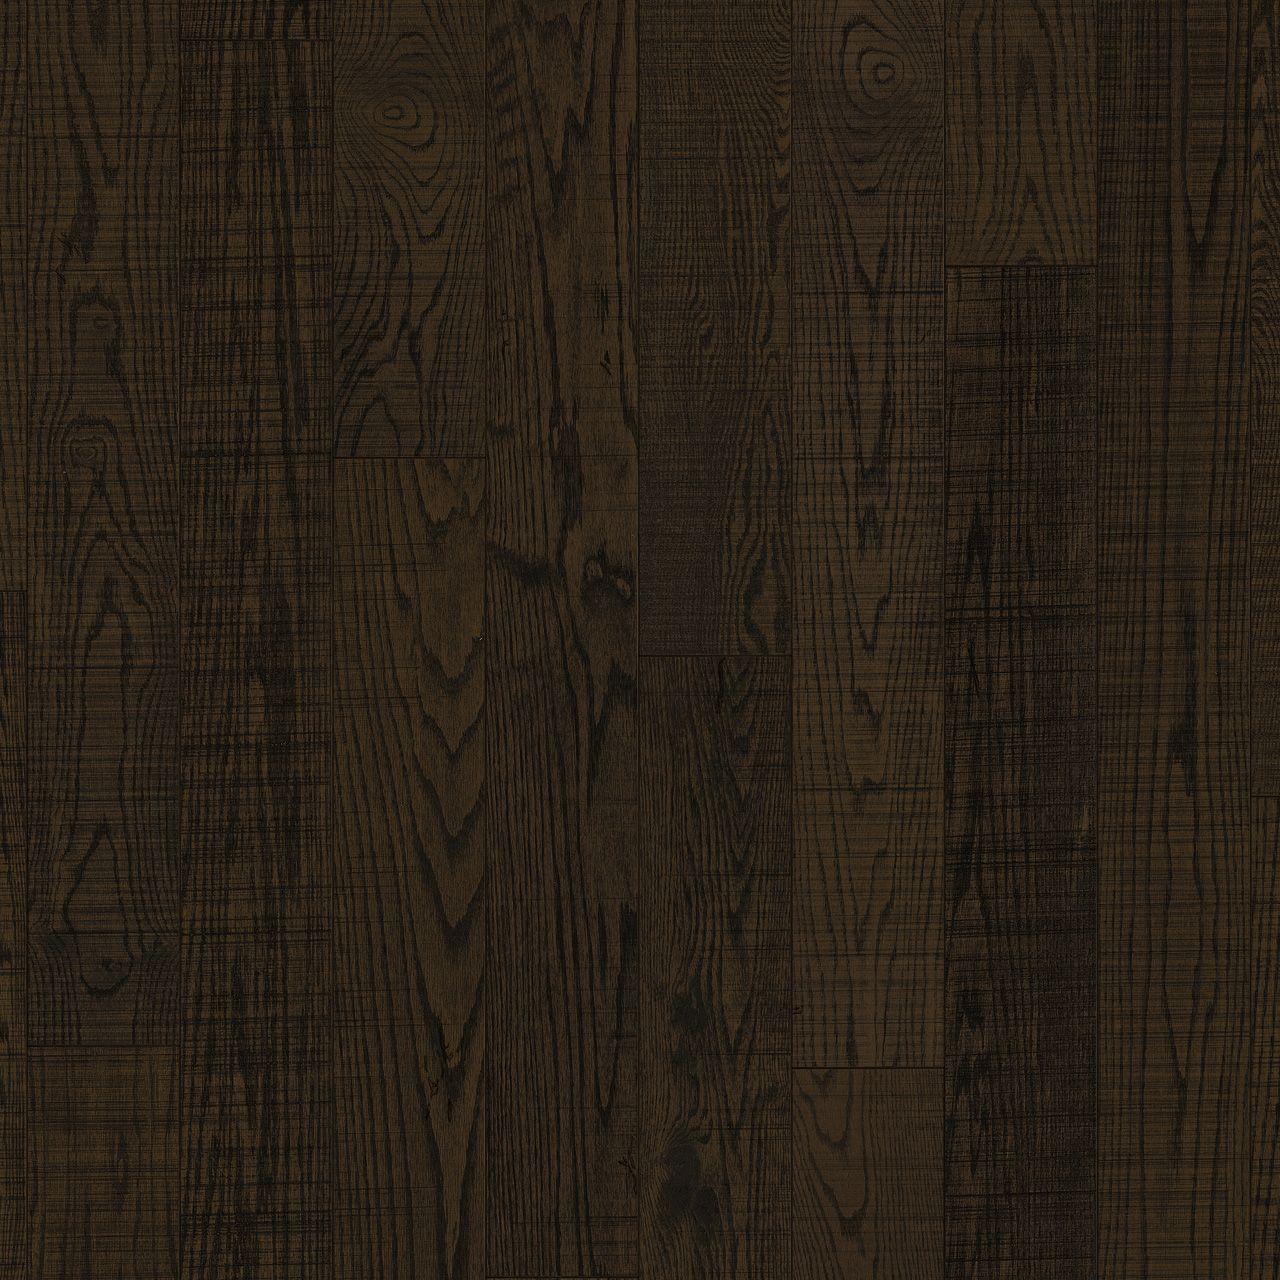 Red Oak Zermatt Edge Hardwood Flooring Preverco